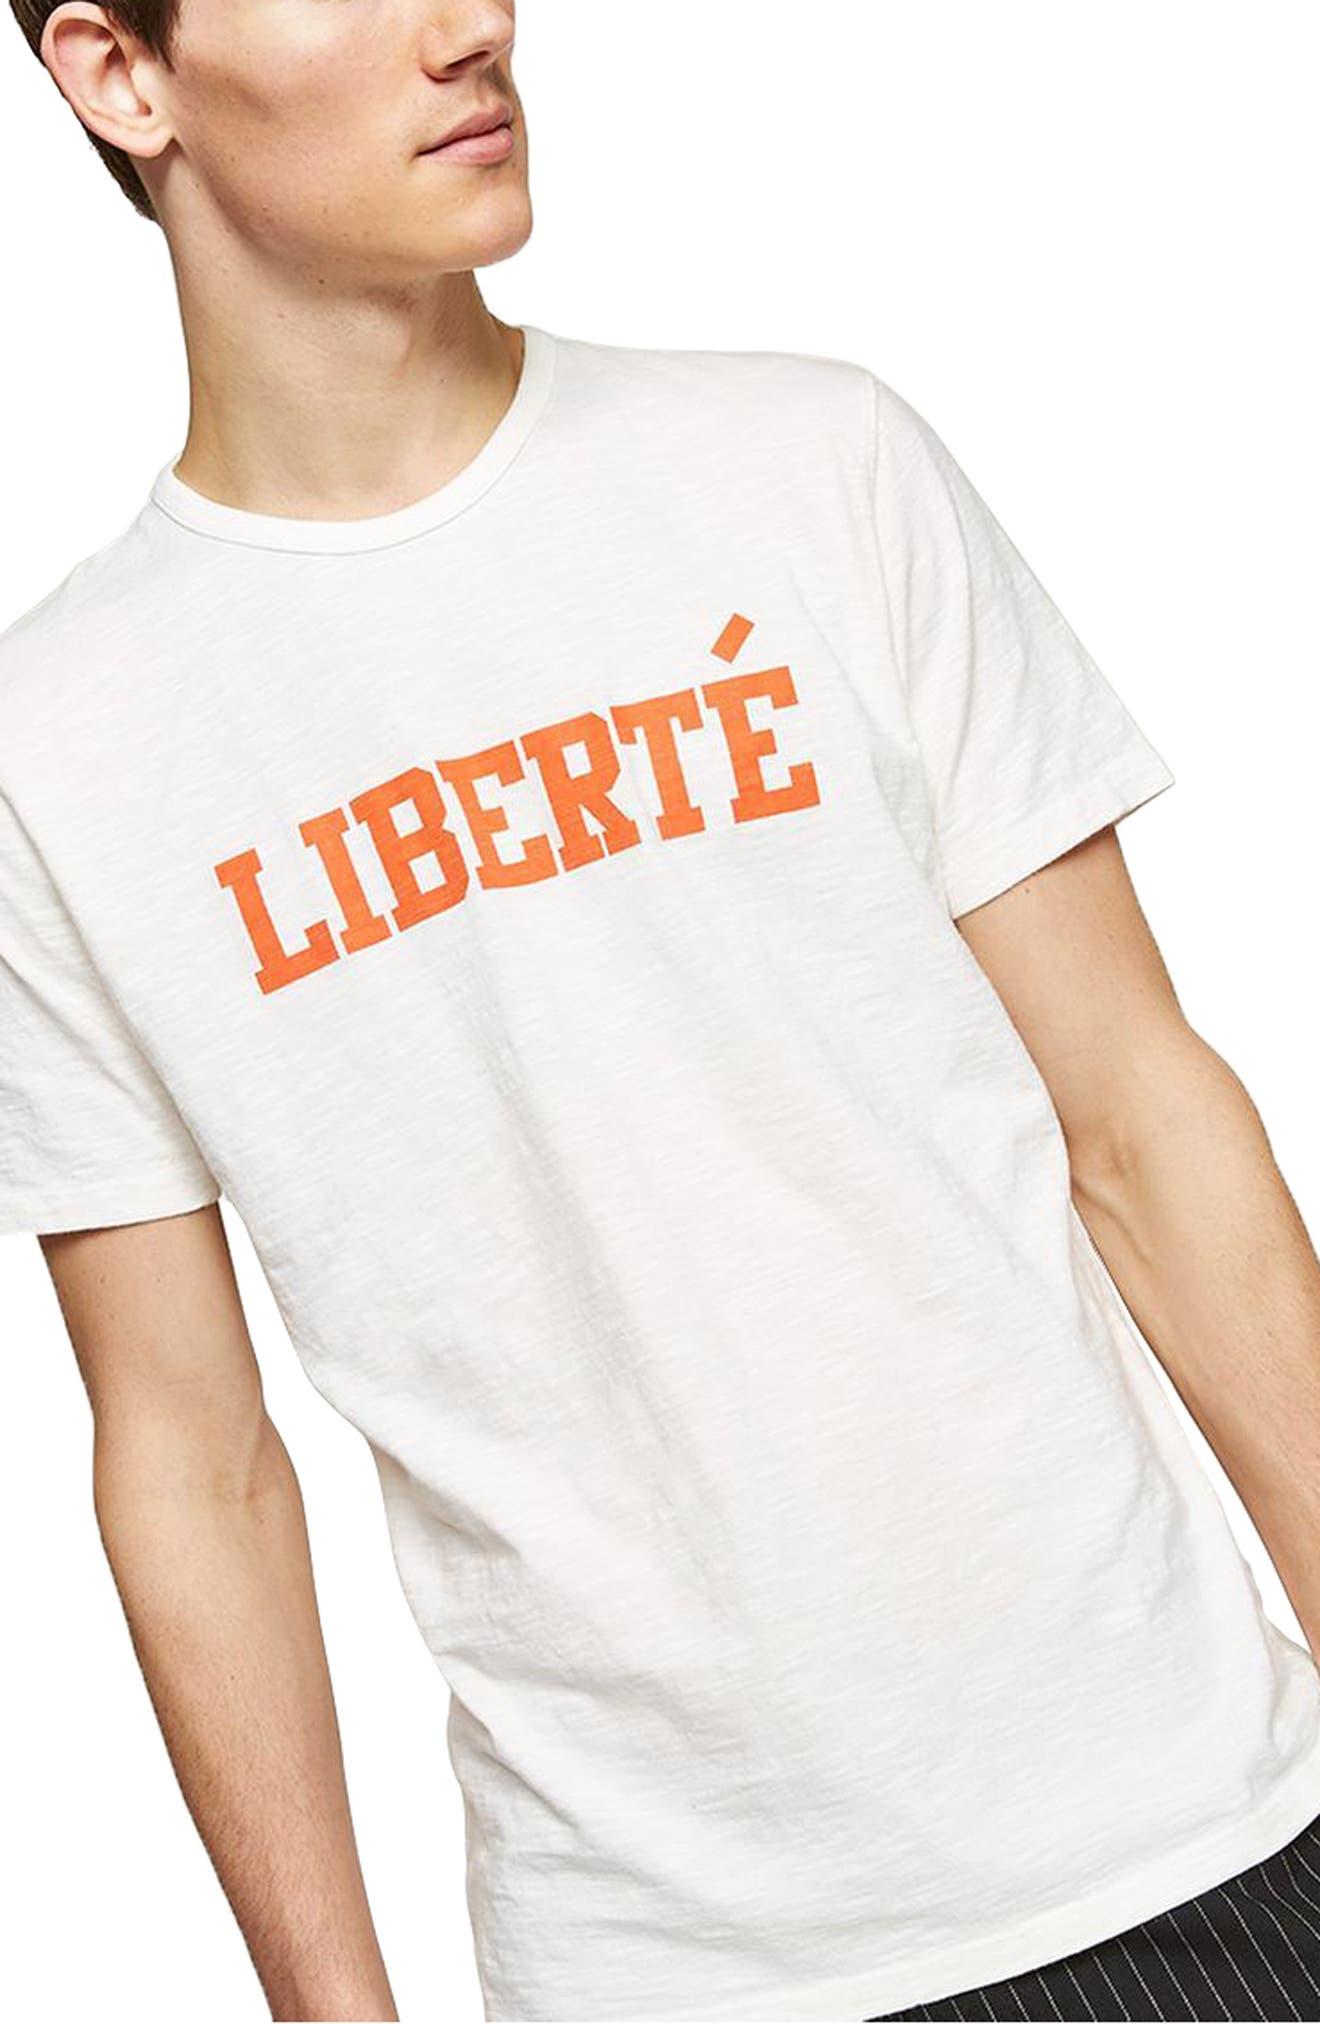 Liberté Graphic T-Shirt,                             Main thumbnail 1, color,                             White Multi